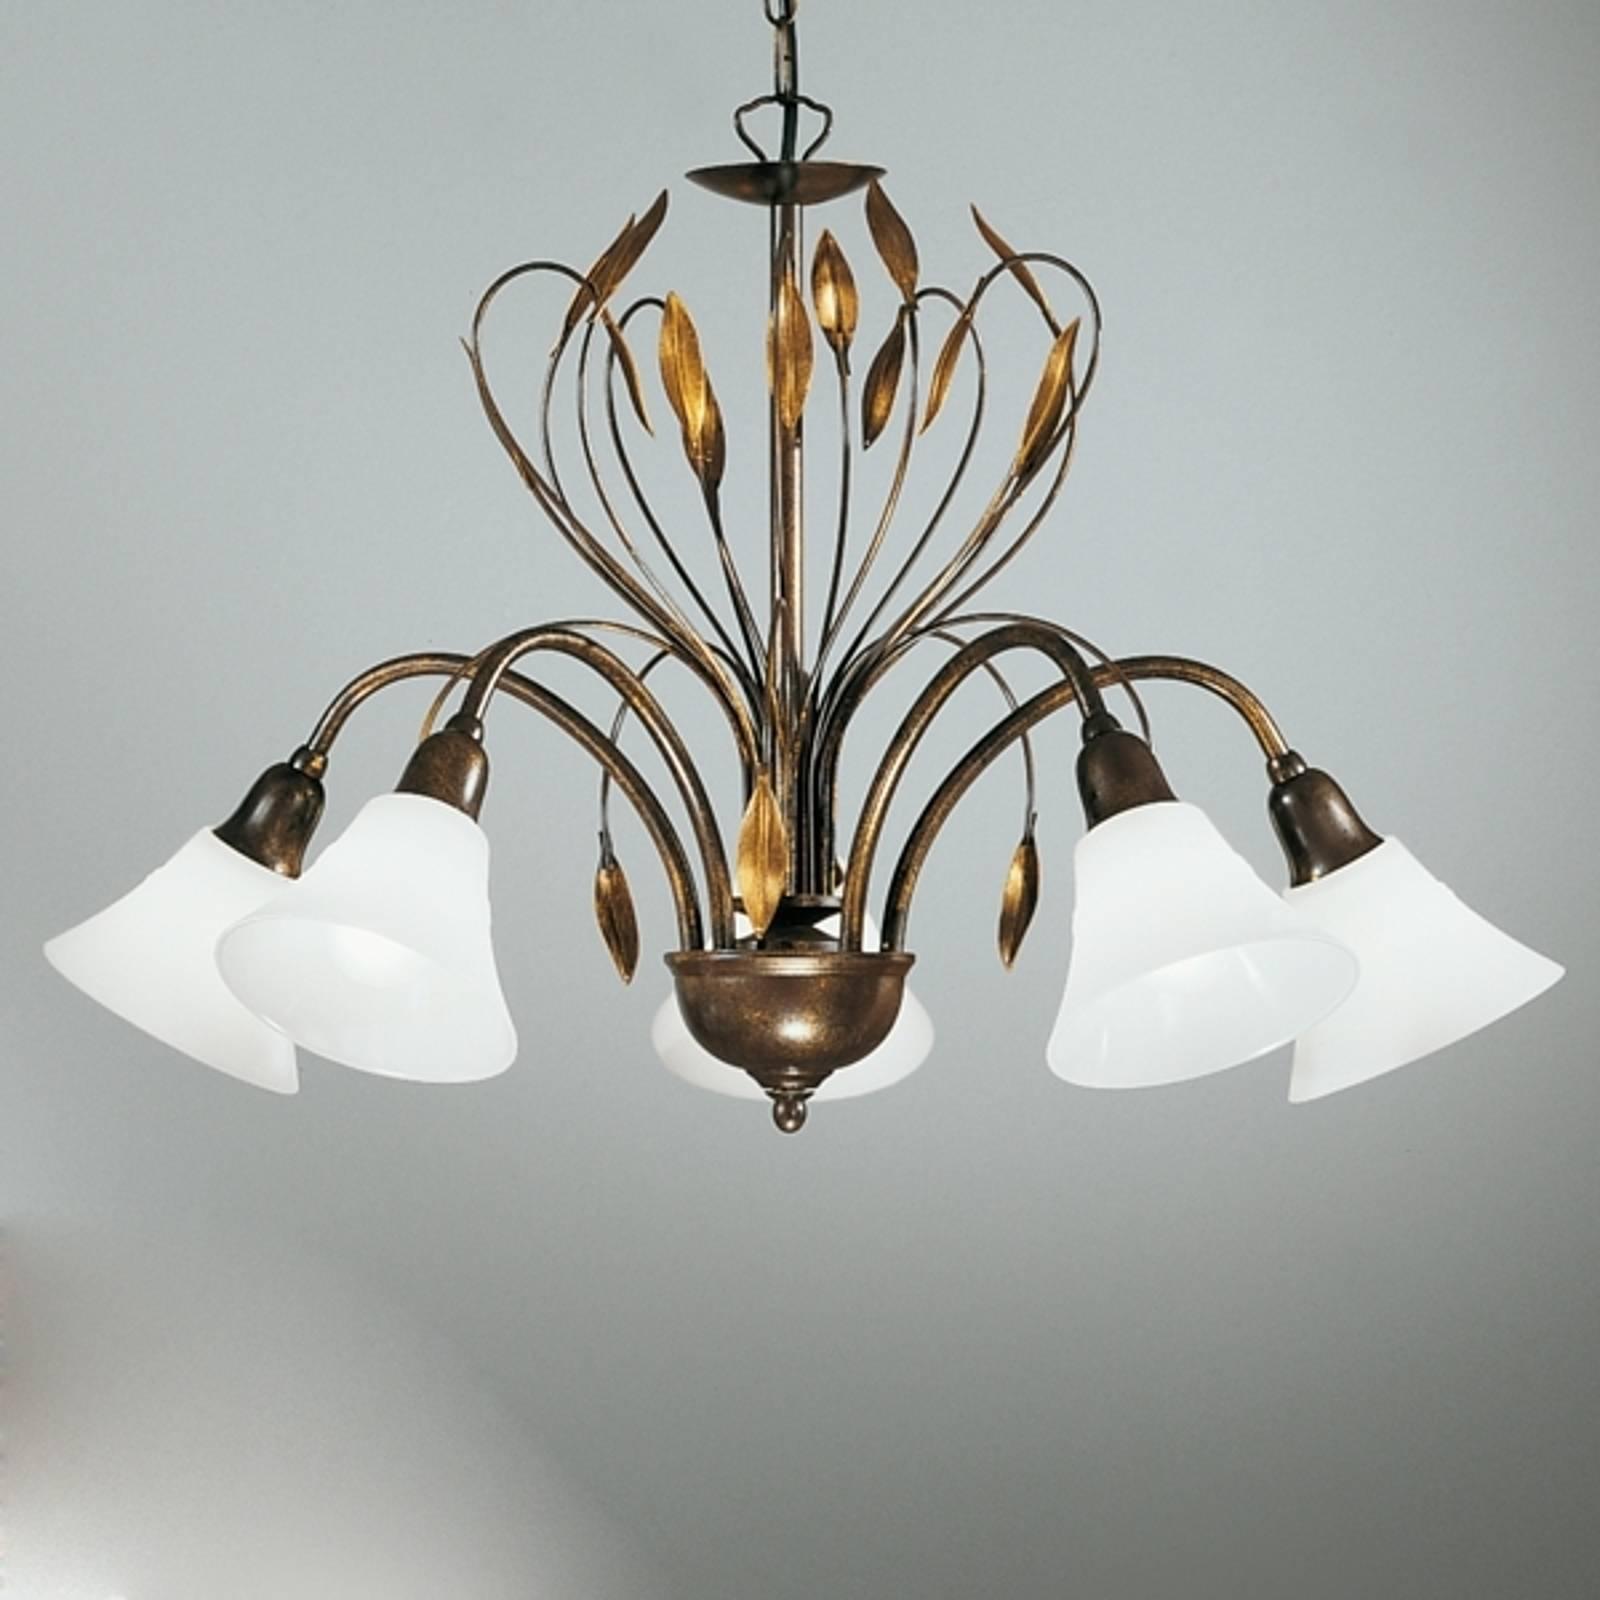 Szlachetna lampa wisząca CAMPANA, 5-punktowa